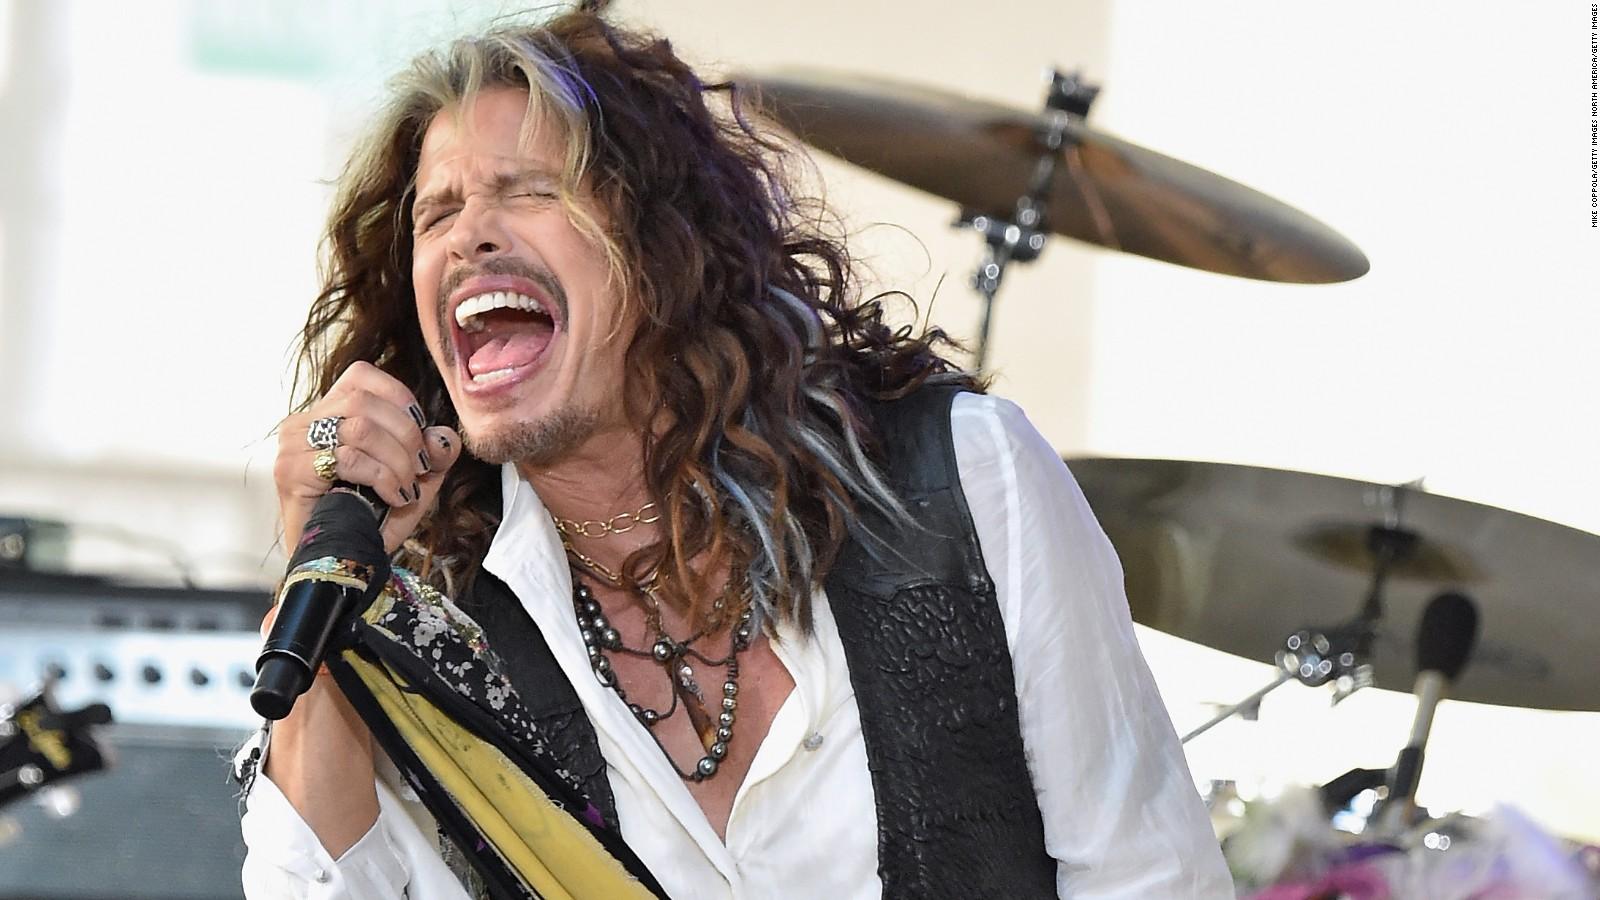 Aerosmith tour crocked after steven tyler surgery nudes (28 photos), Paparazzi Celebrites picture